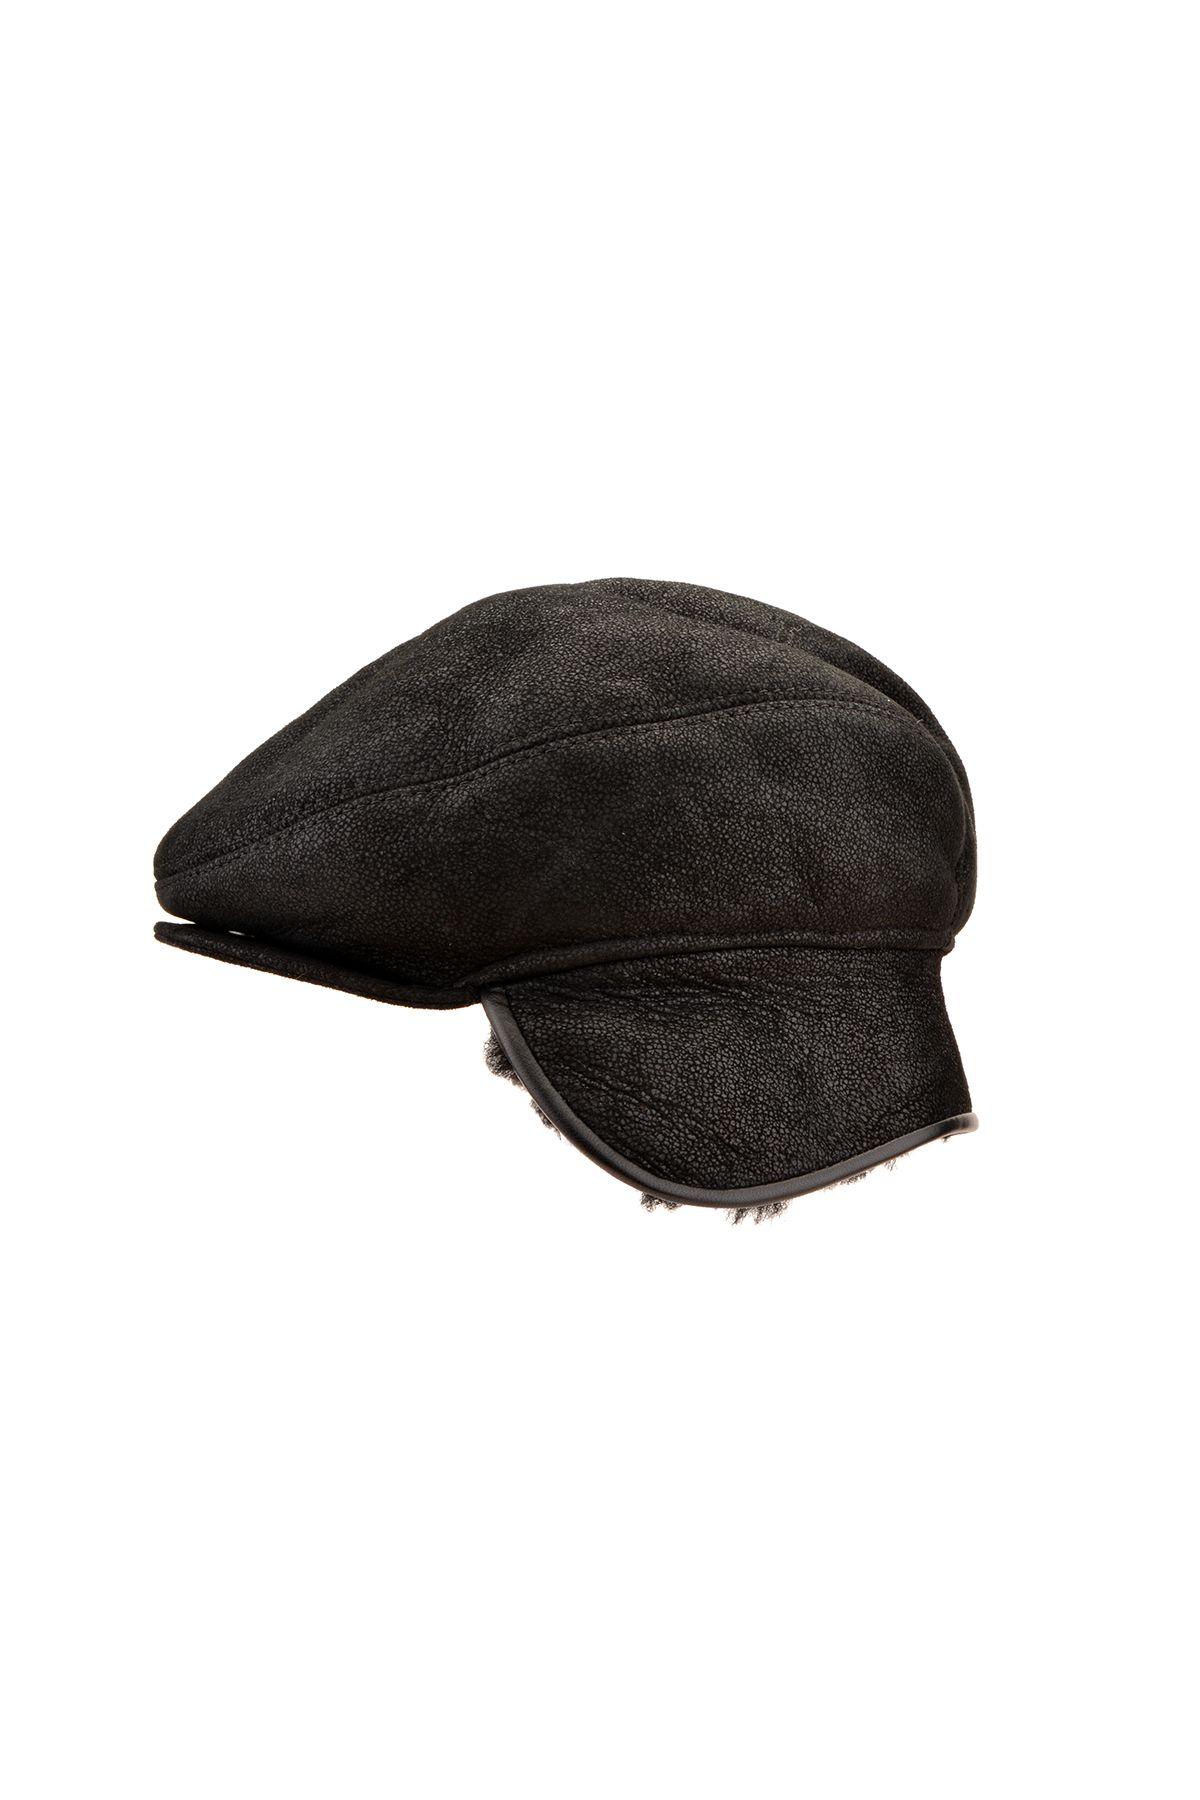 Pegia Hakiki Vintage Deri İçi Kürk Kep Şapka 18AS15 Siyah